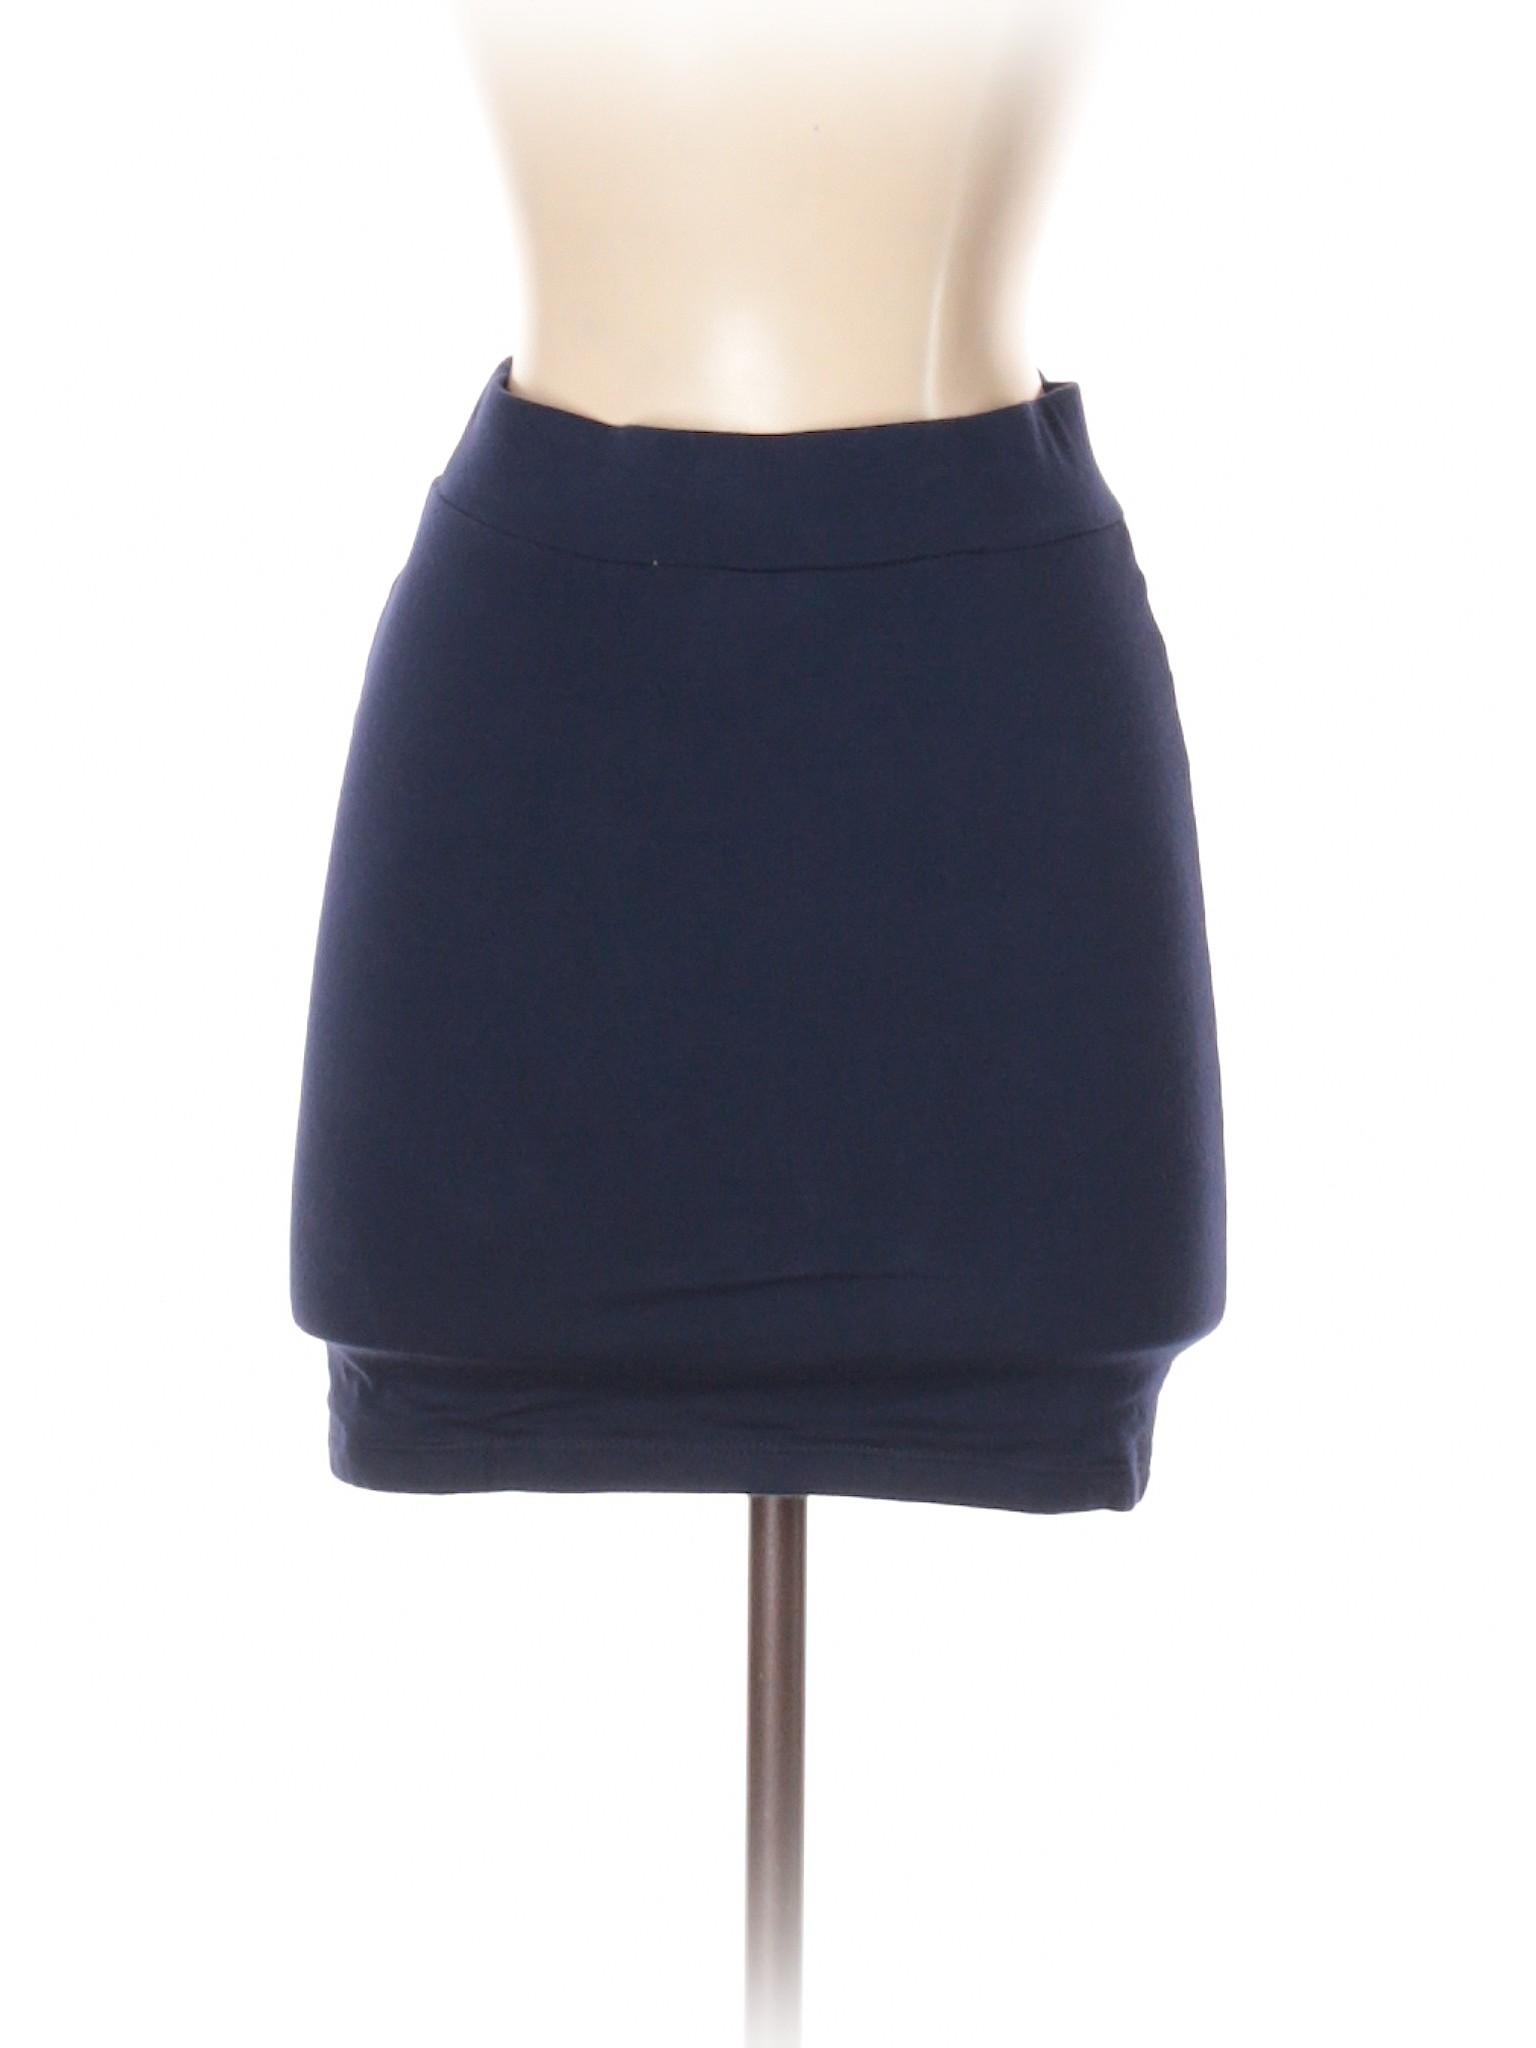 Casual Forever Skirt winter 21 Leisure 1twq5ZFZ